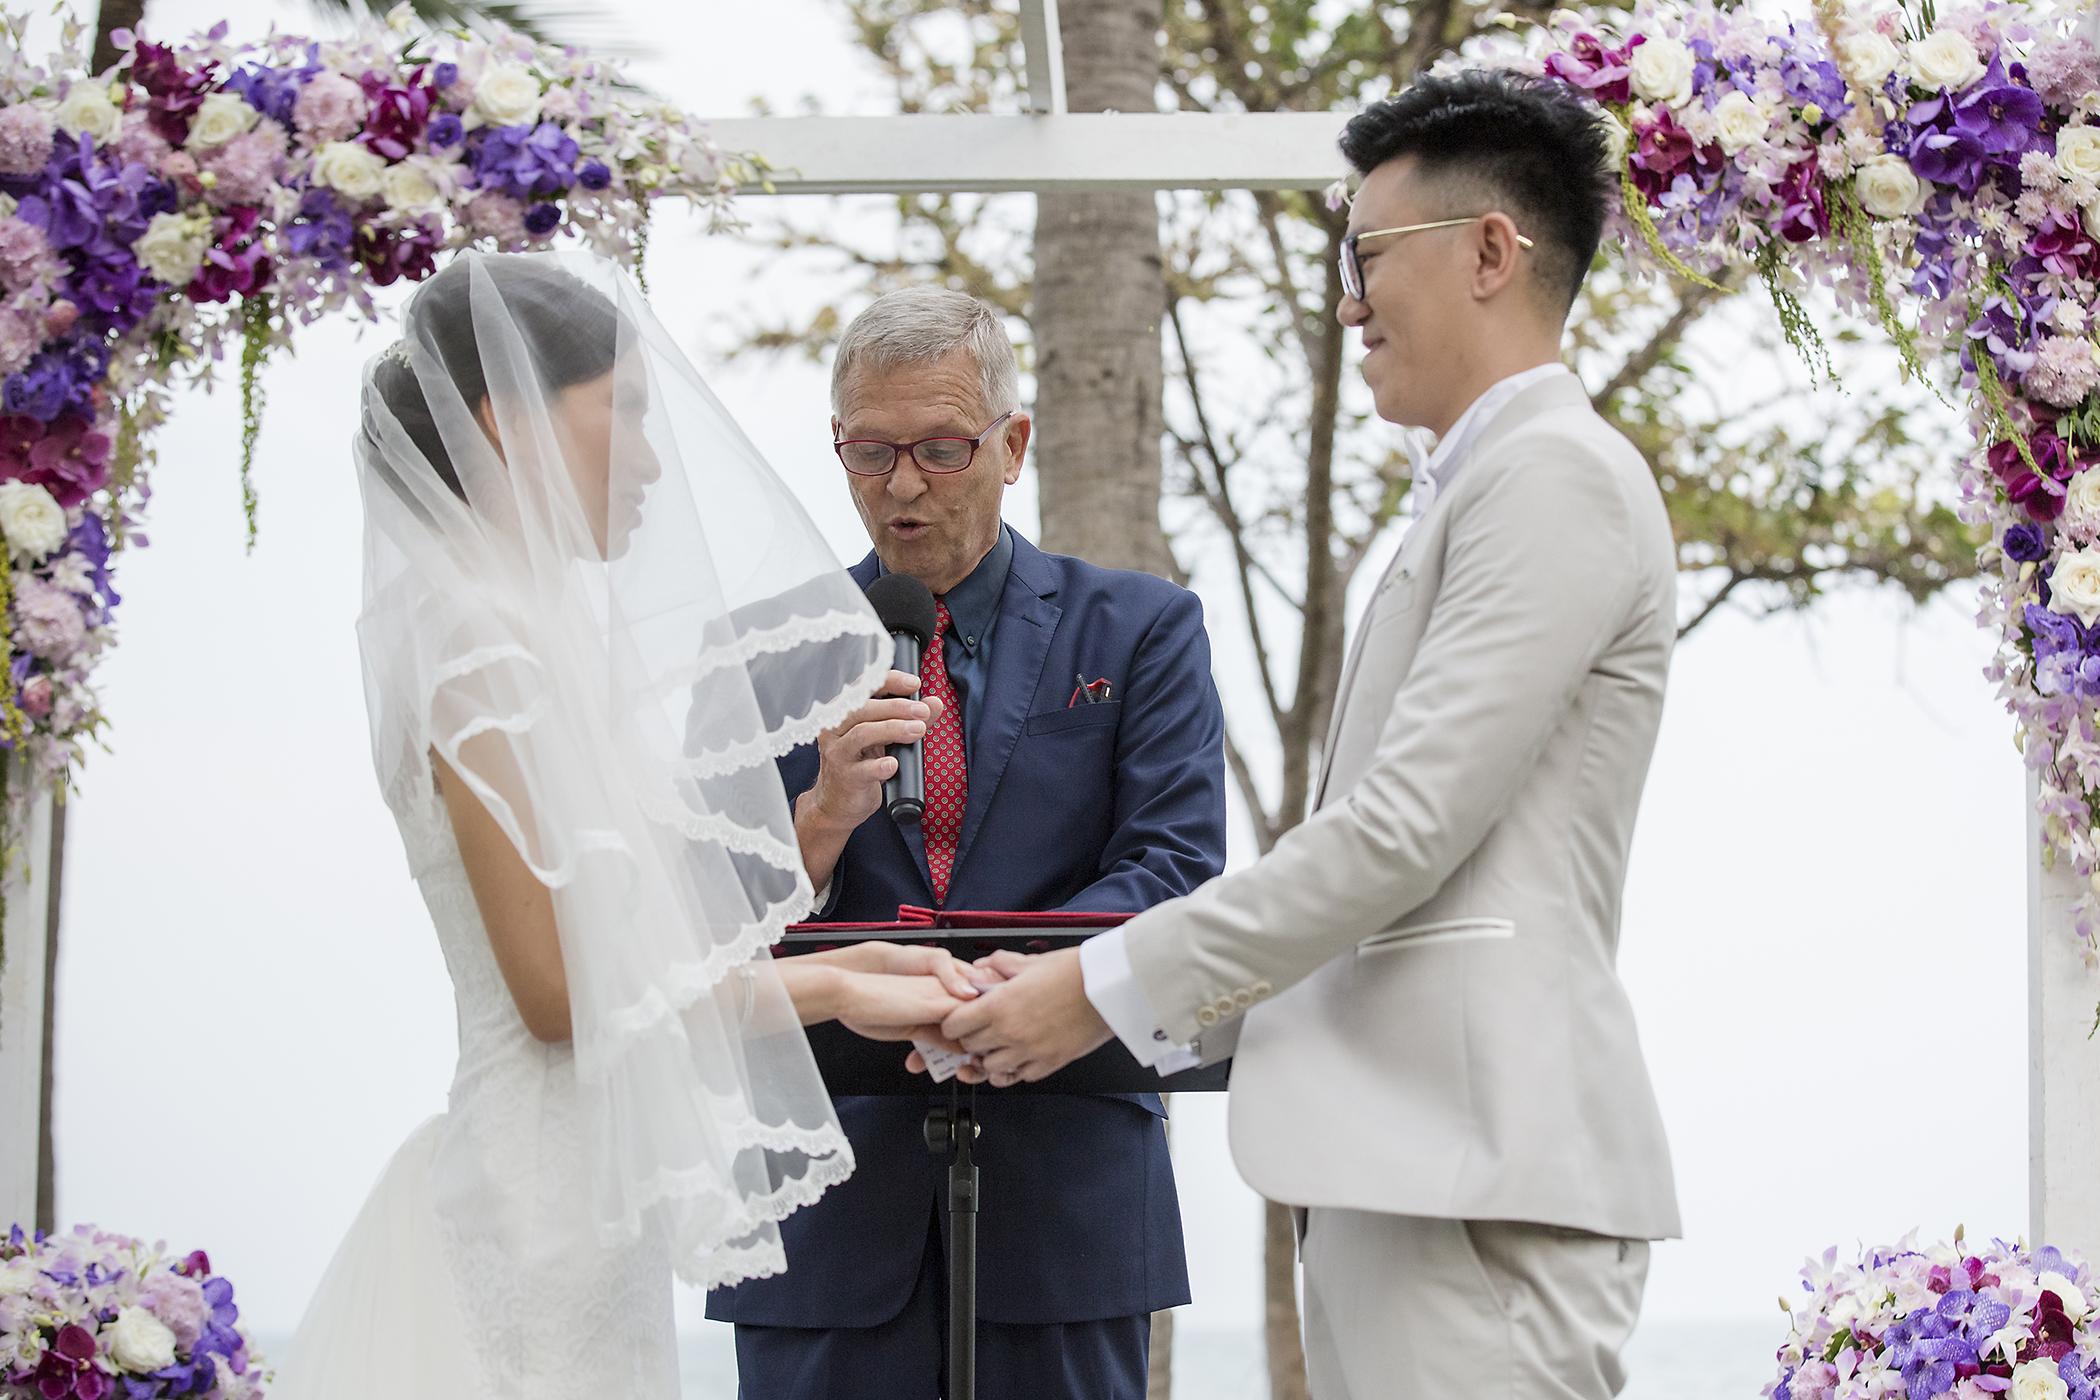 moe-keith-wedding-7.jpg